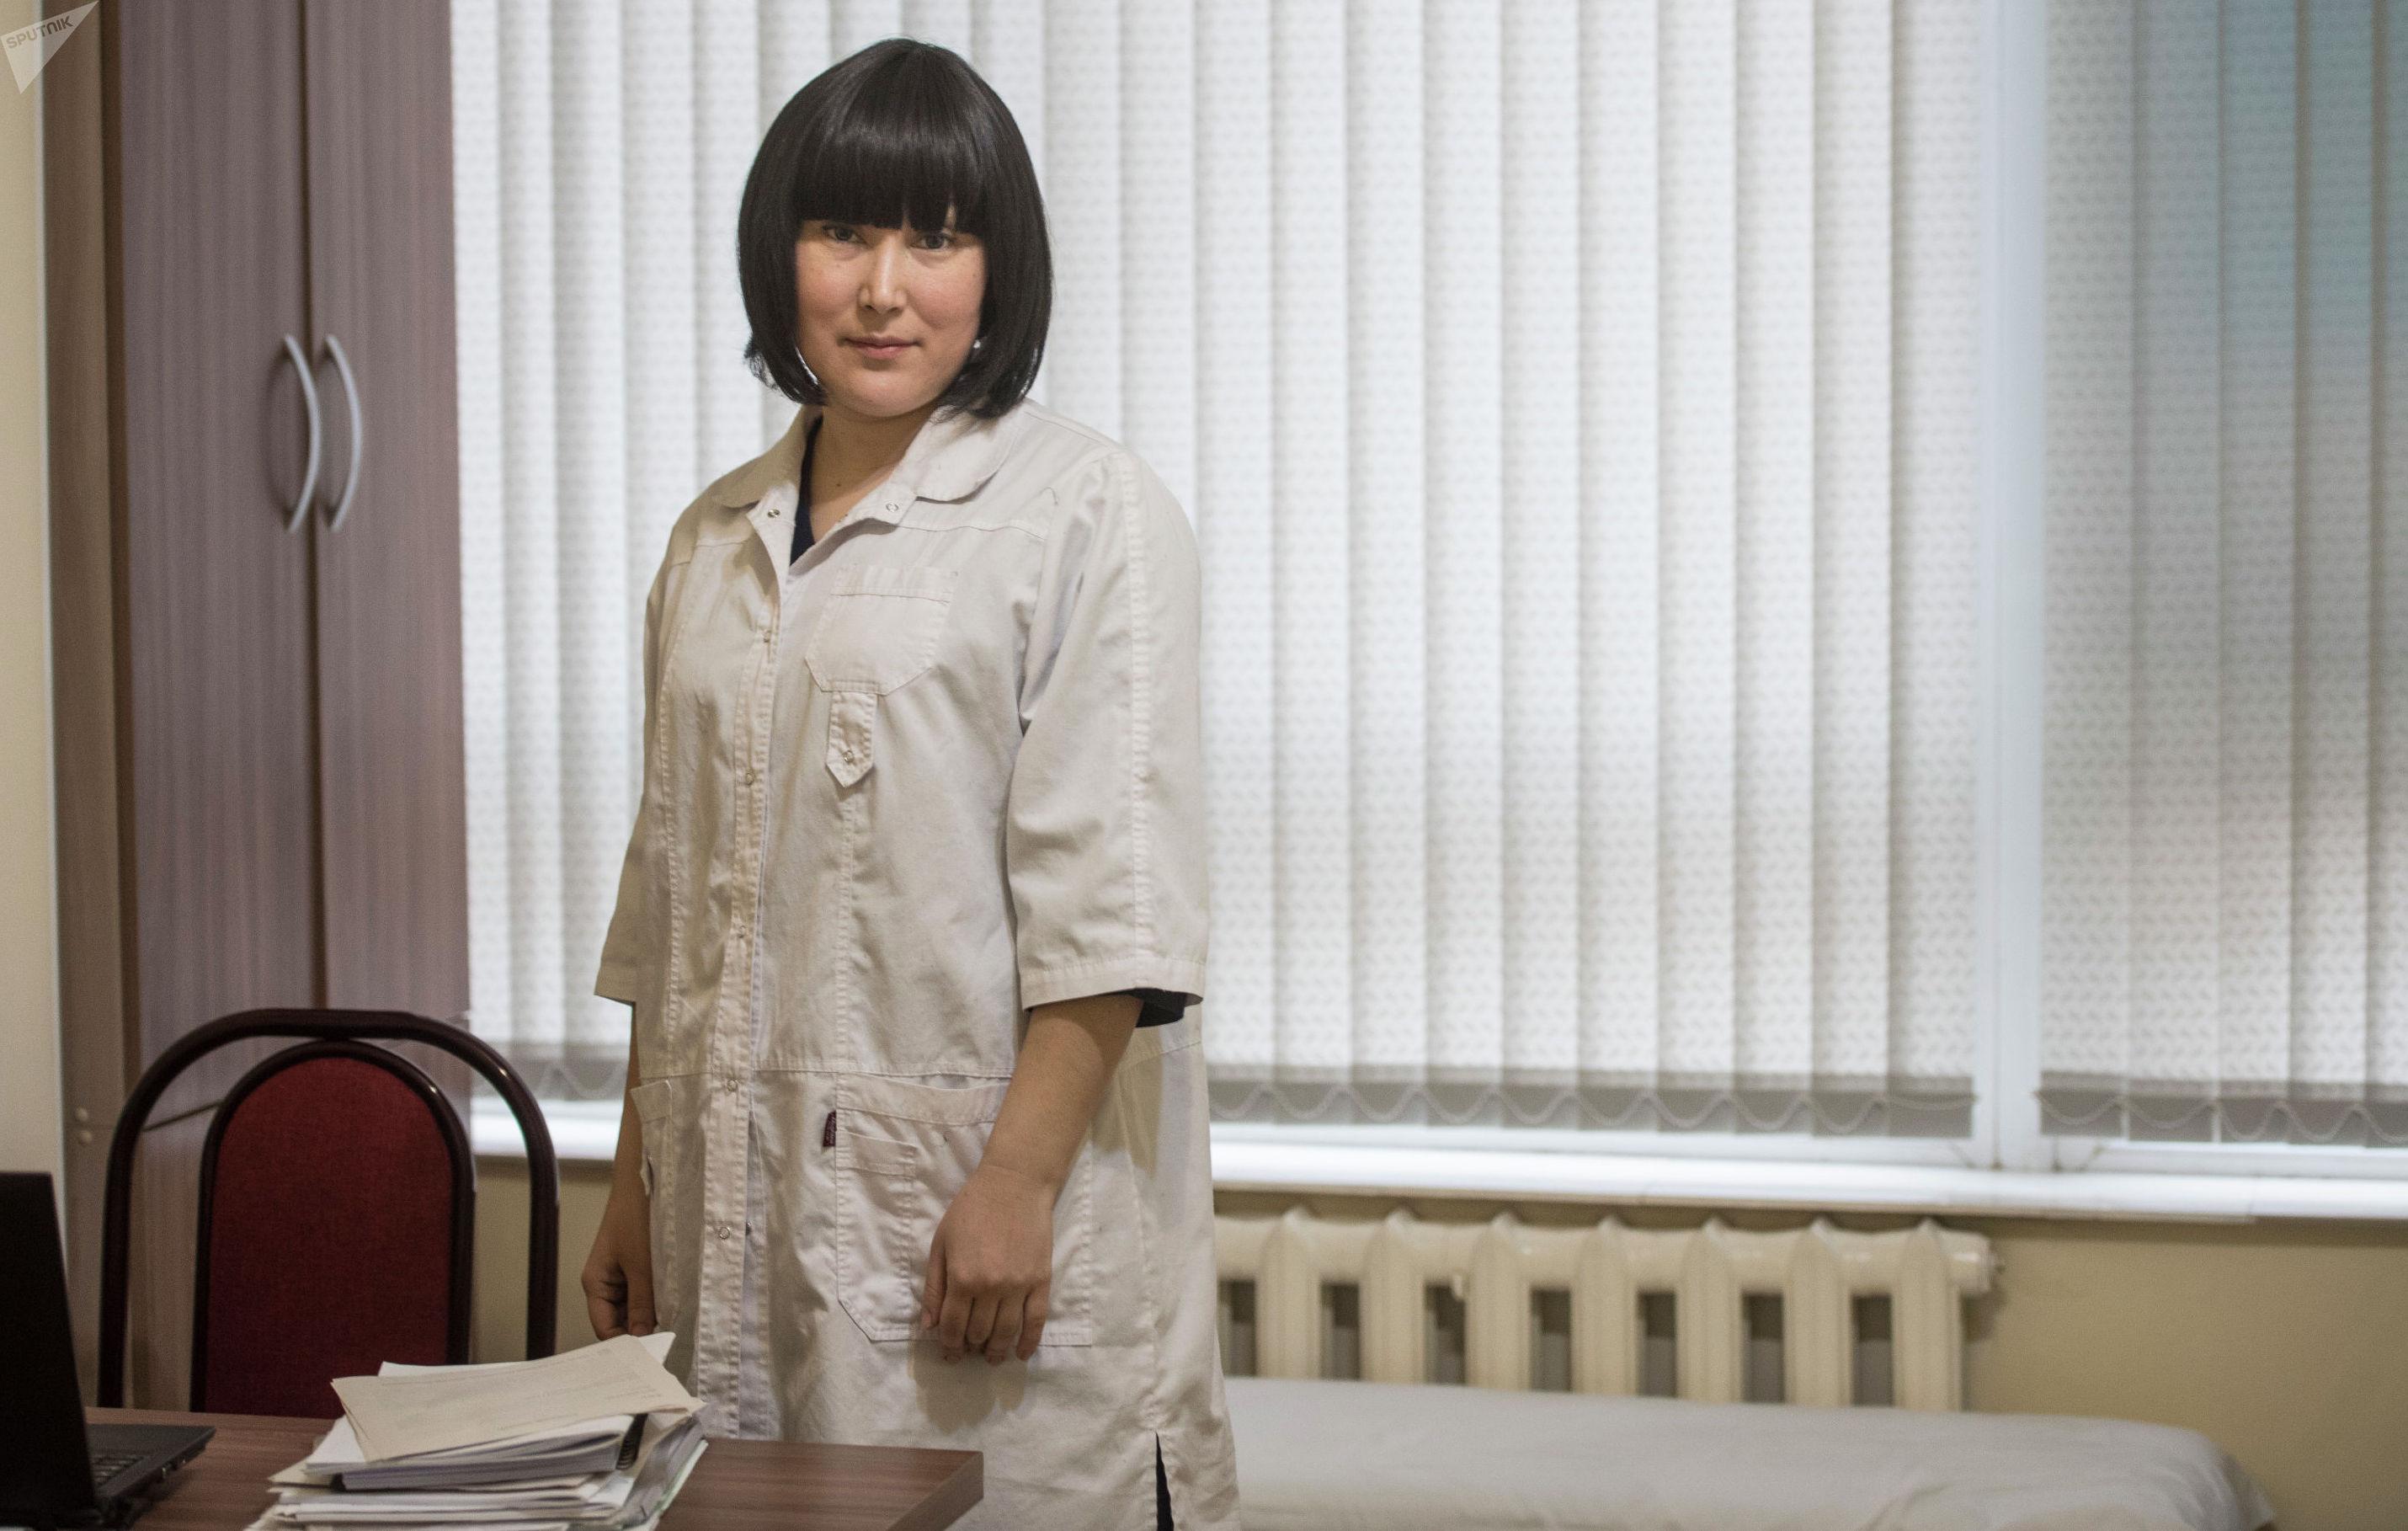 Врач-генетик, кандидат медицинских наук Бибигюль Карыпбаева